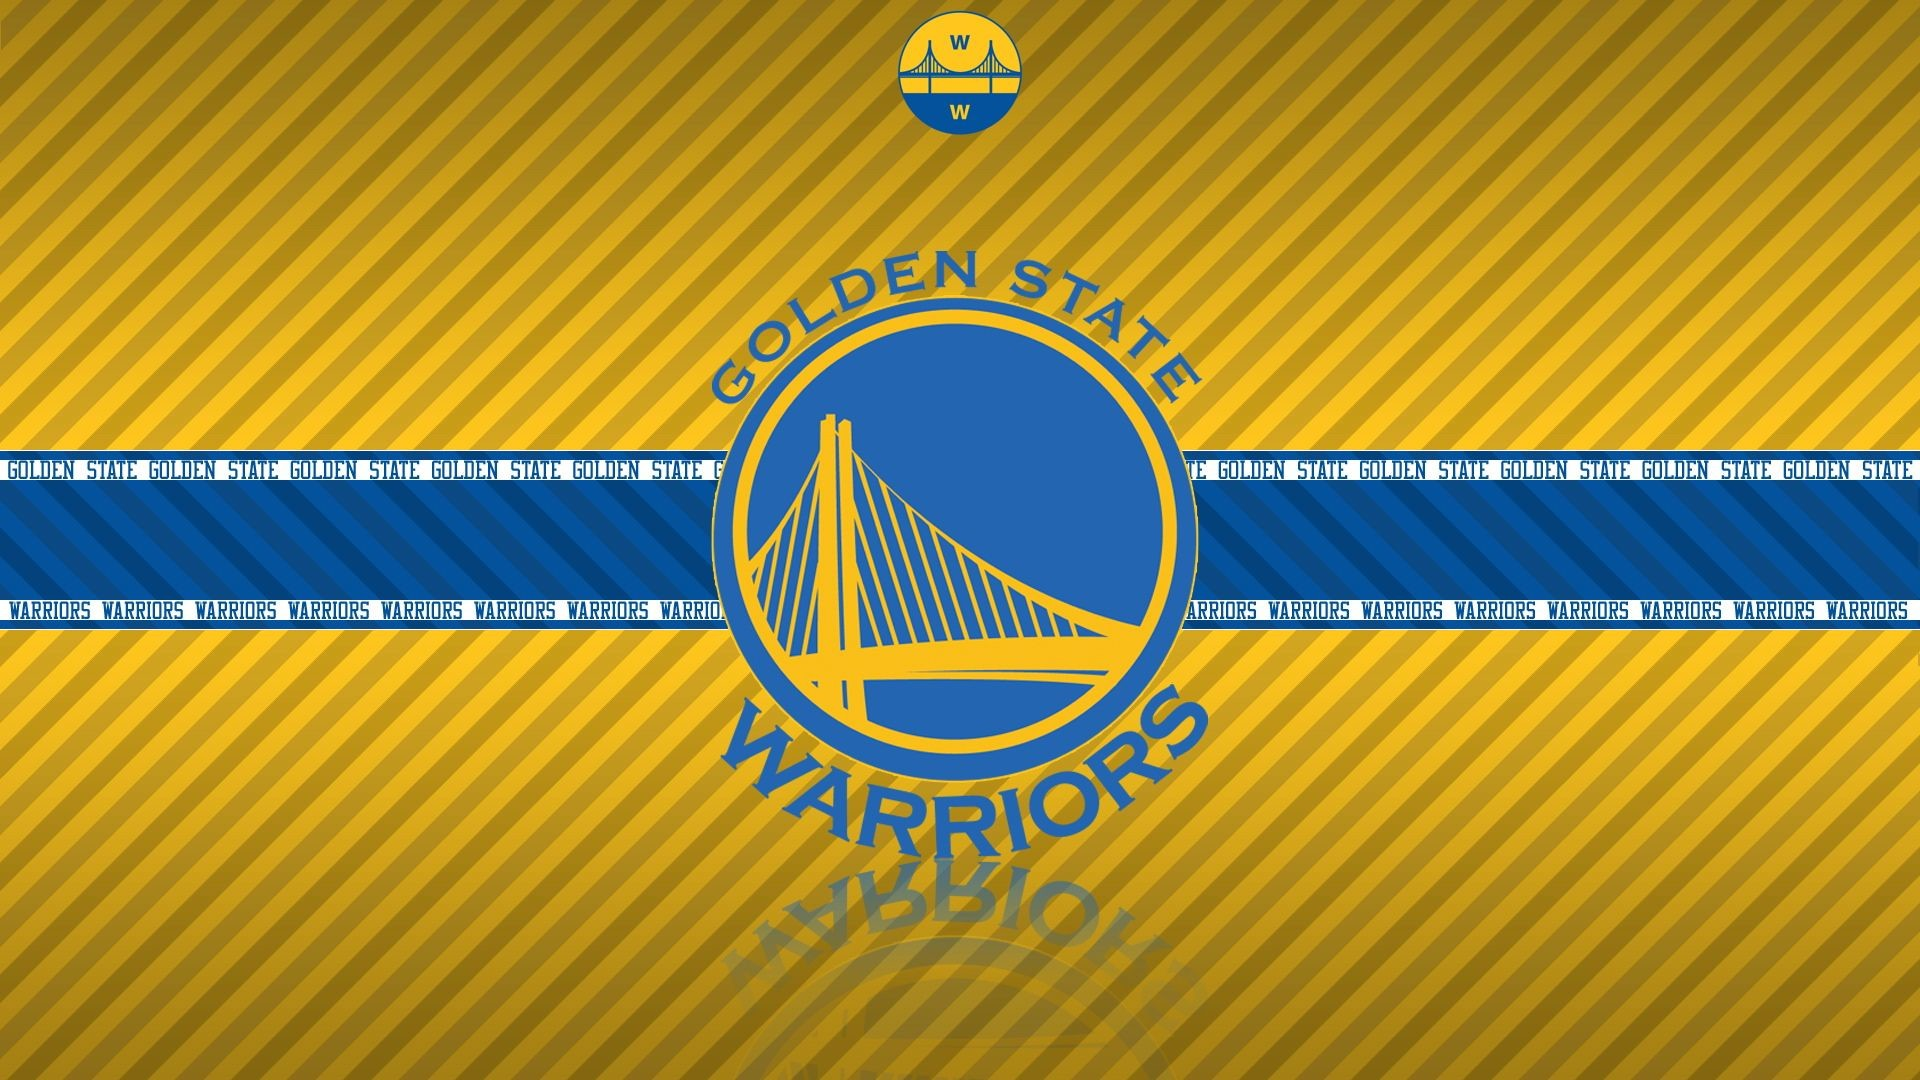 Res: 1920x1080, Golden State Warriors Wallpaper /